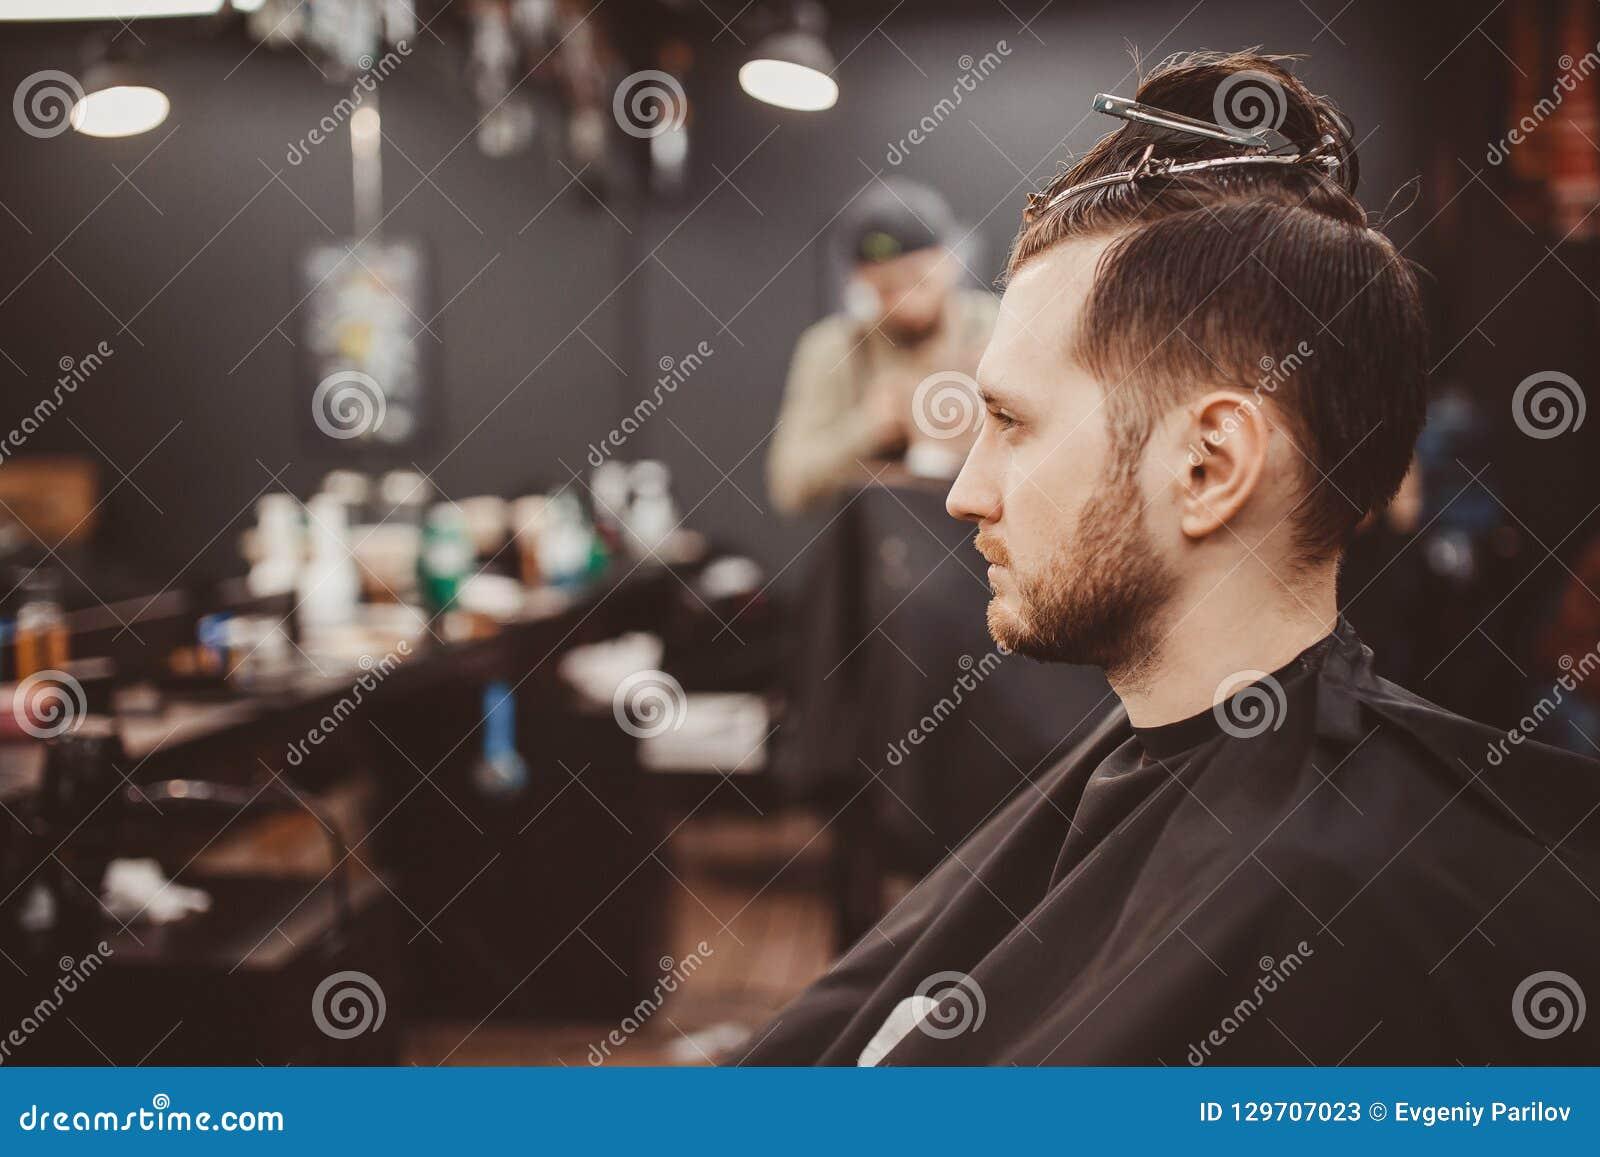 Background Of Hair Salon For Men, Barber Shop Stock Image - Image of owner, clean: 129707023